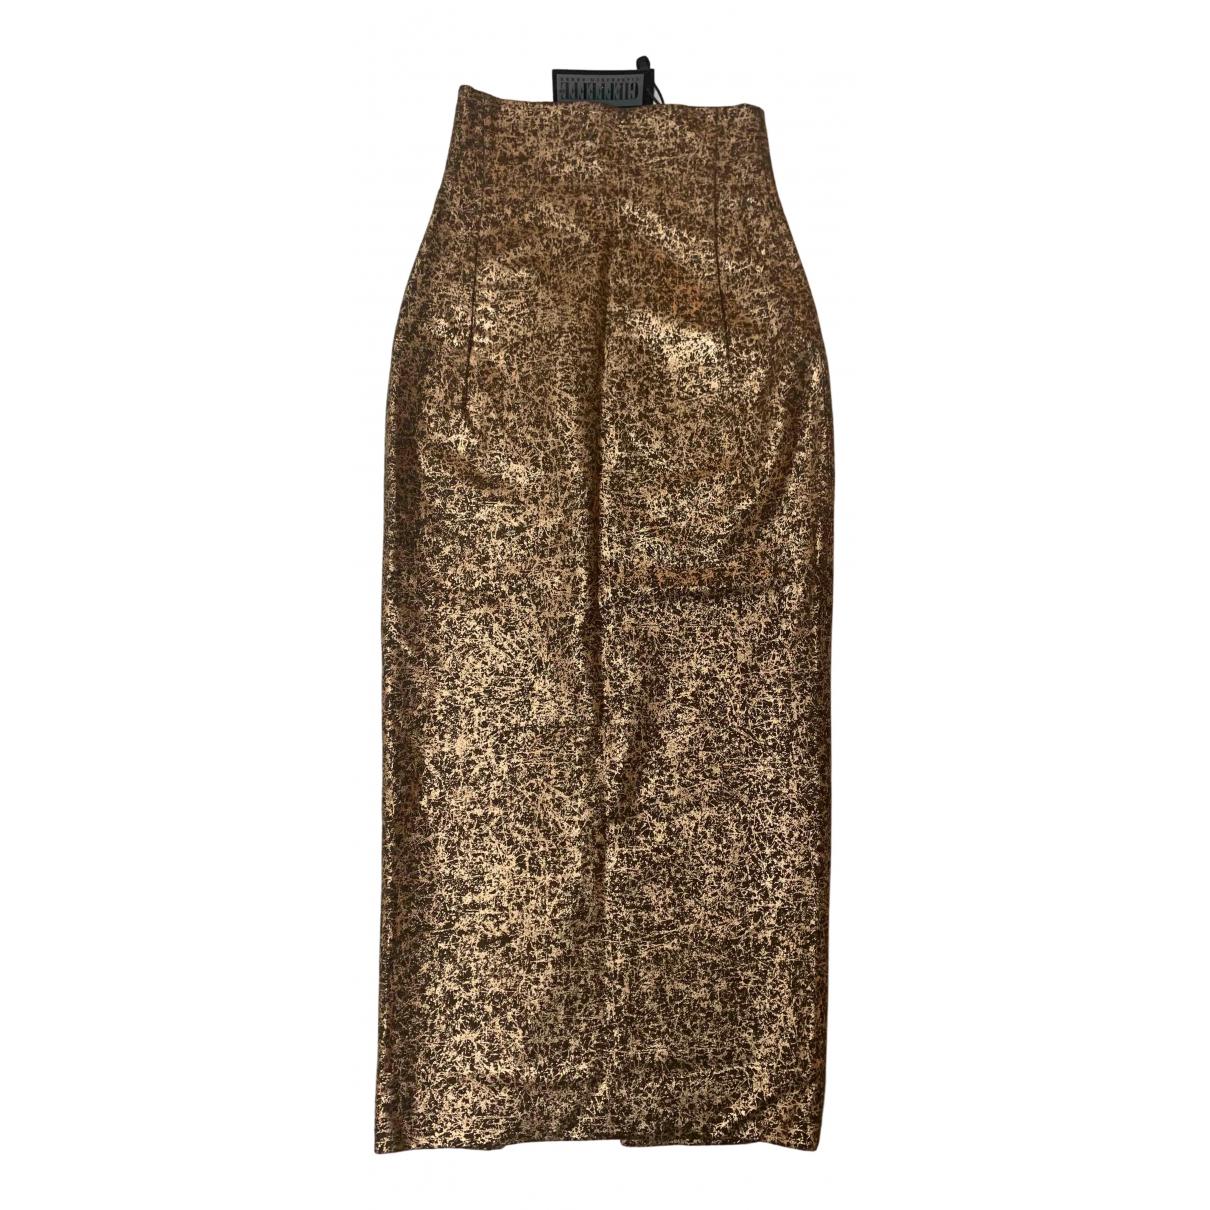 Gianfranco Ferré N Metallic Wool skirt for Women 36 FR